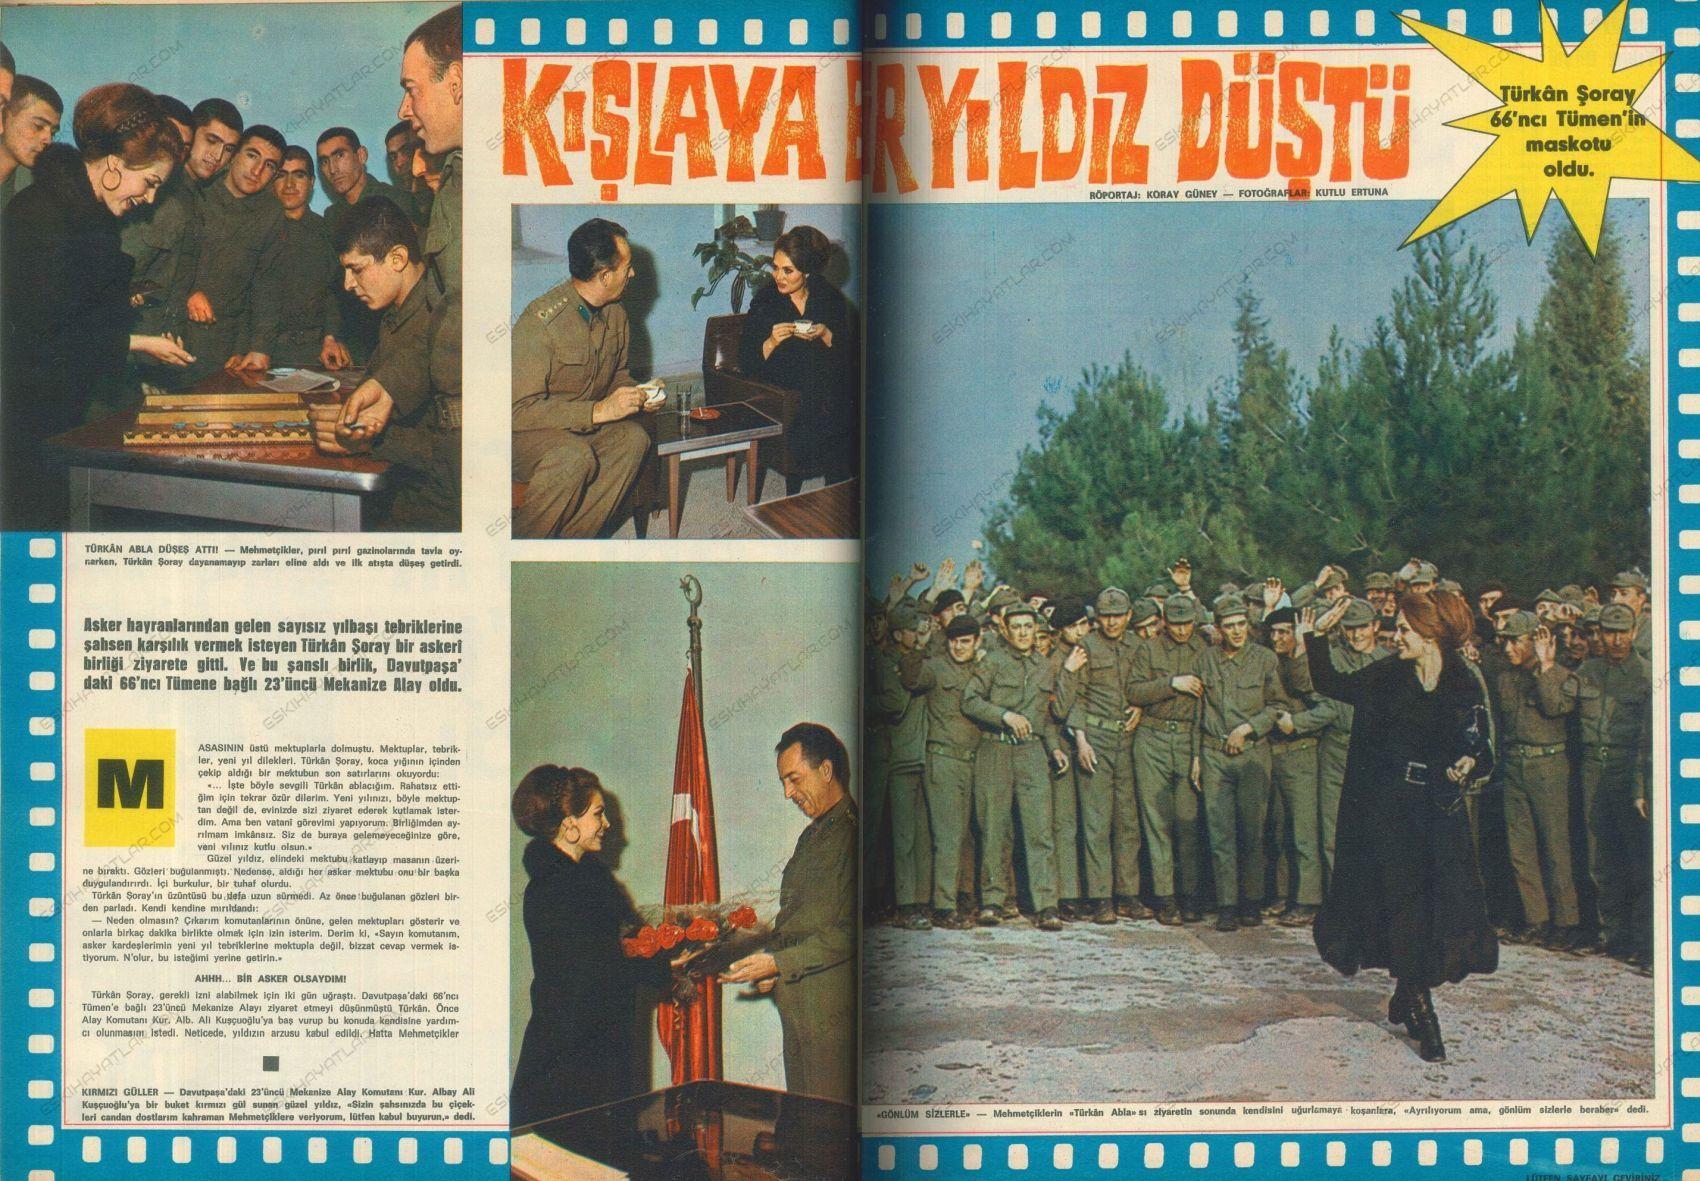 turkan-soray-davutpasa-kislasinda-mehmetcik-ziyaretinde-1971-hayat-dergisi (2)